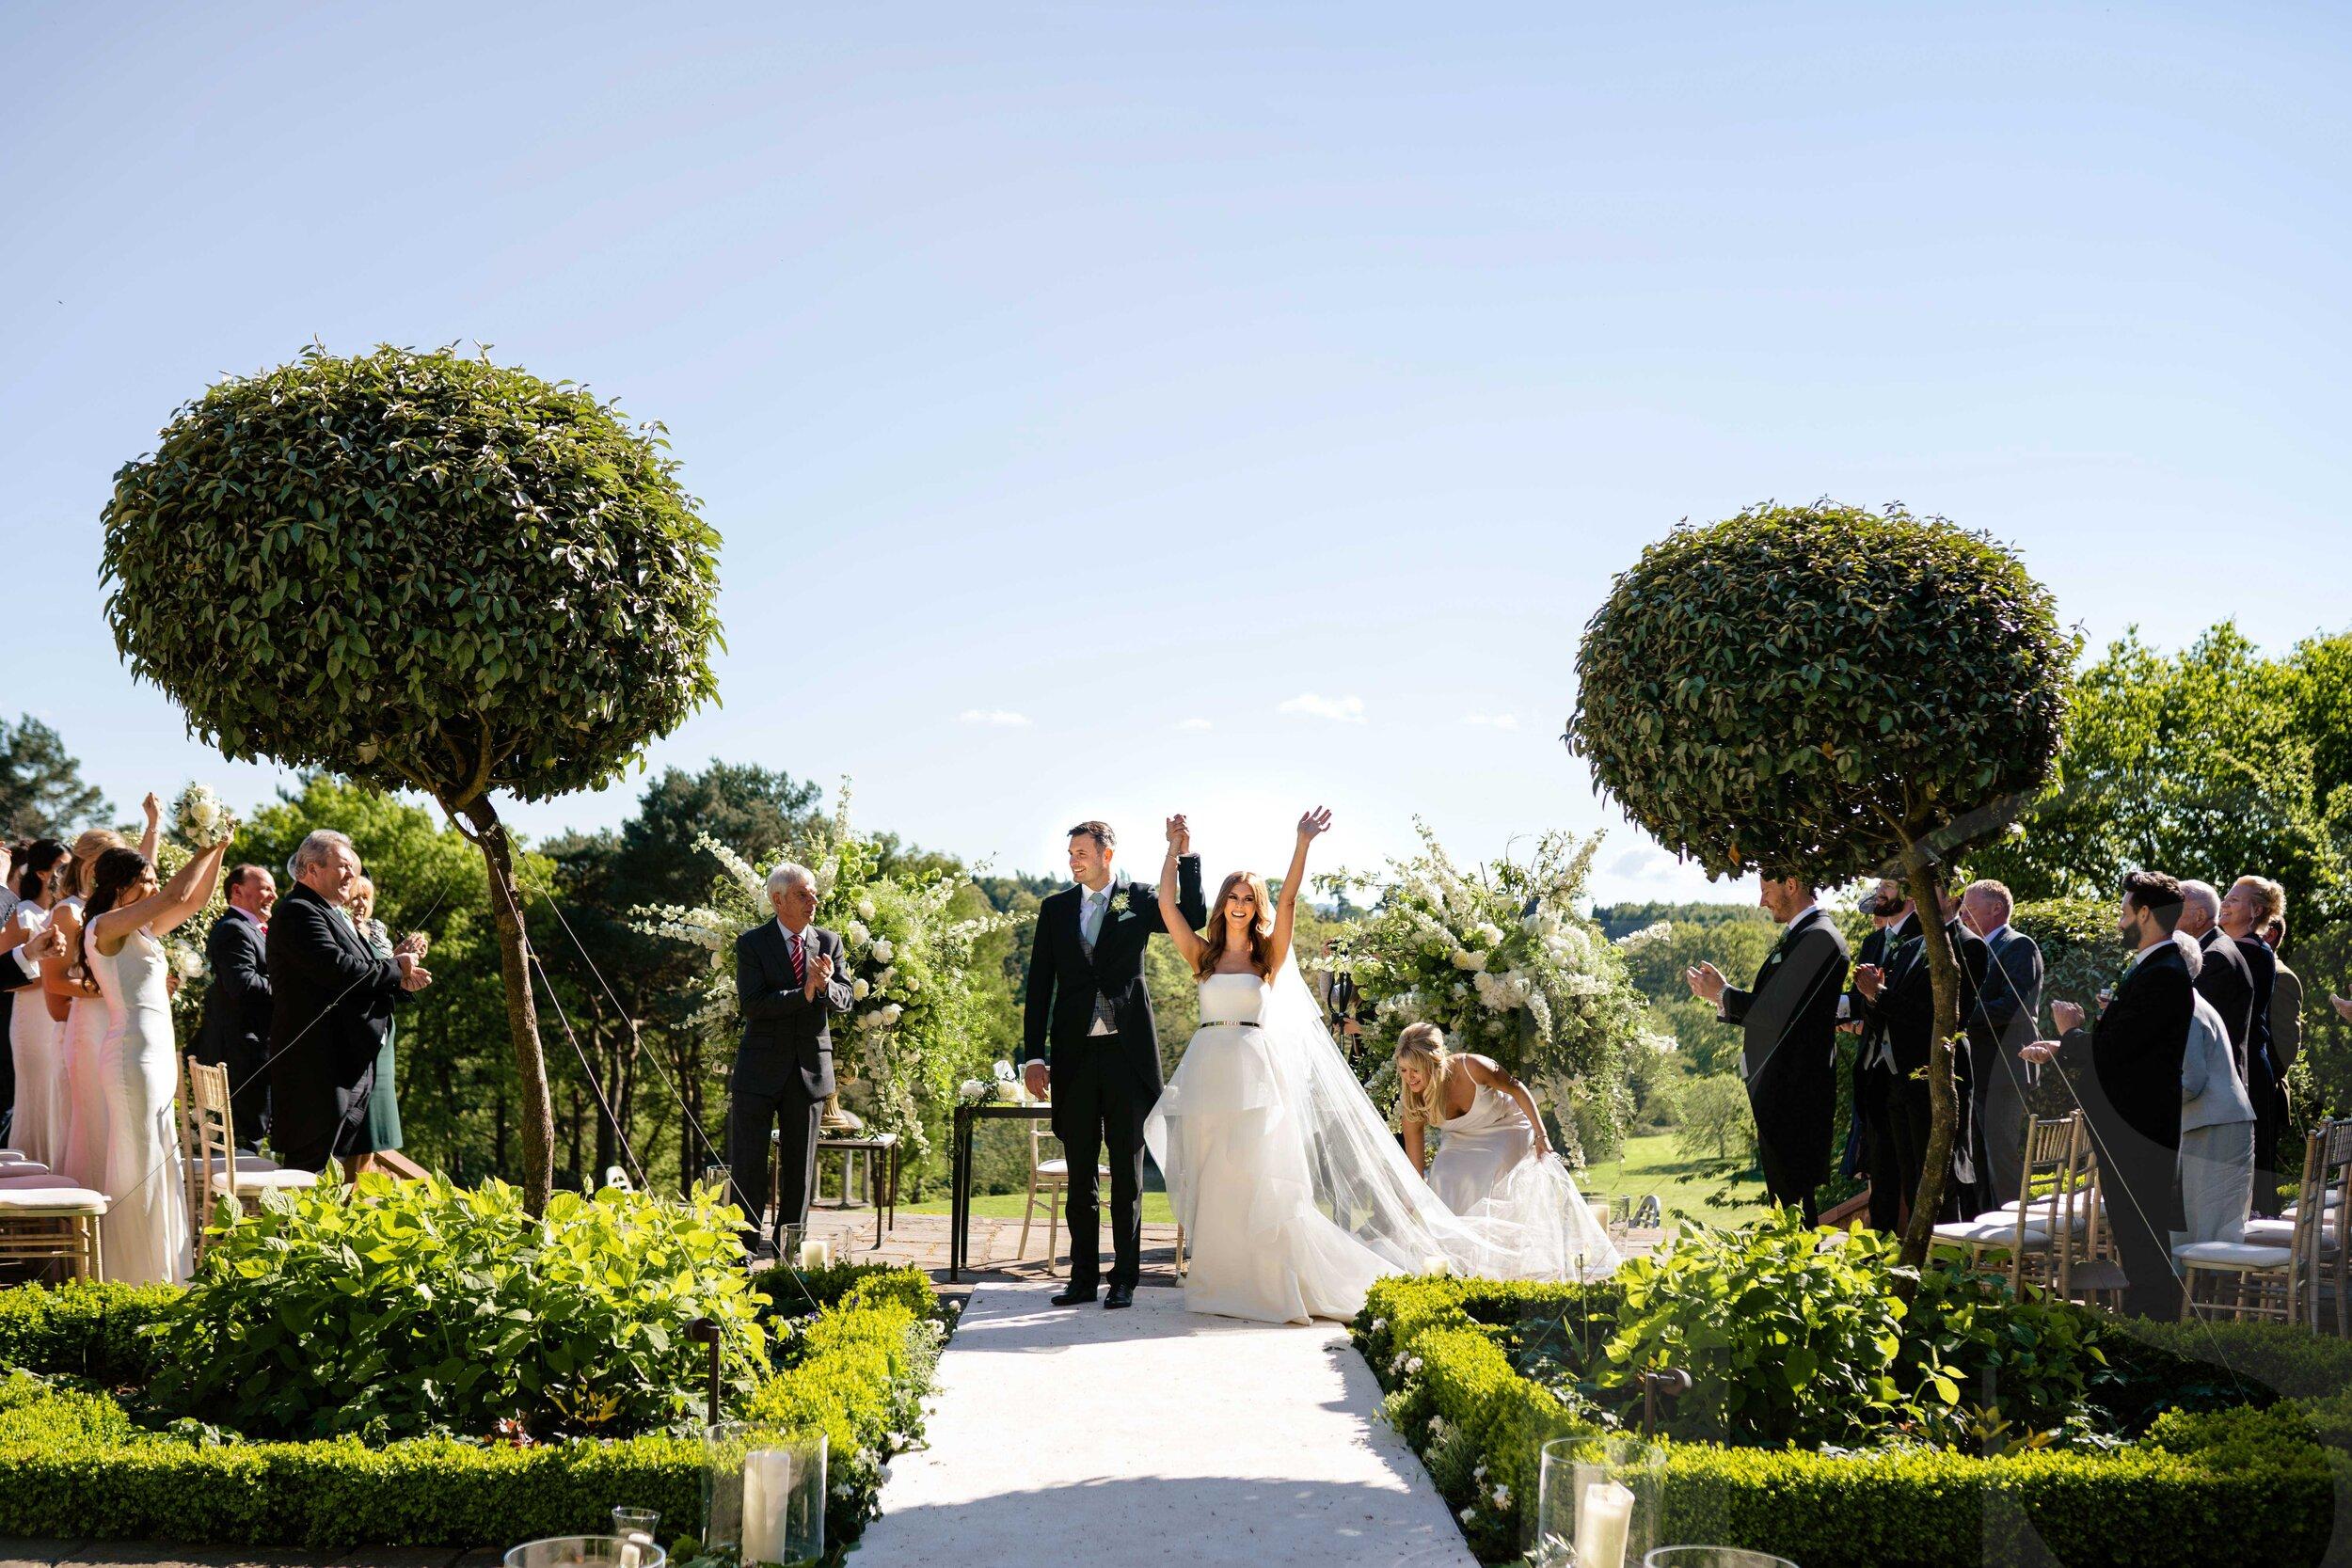 delamere-manor-wedding-photographer-3.jpg